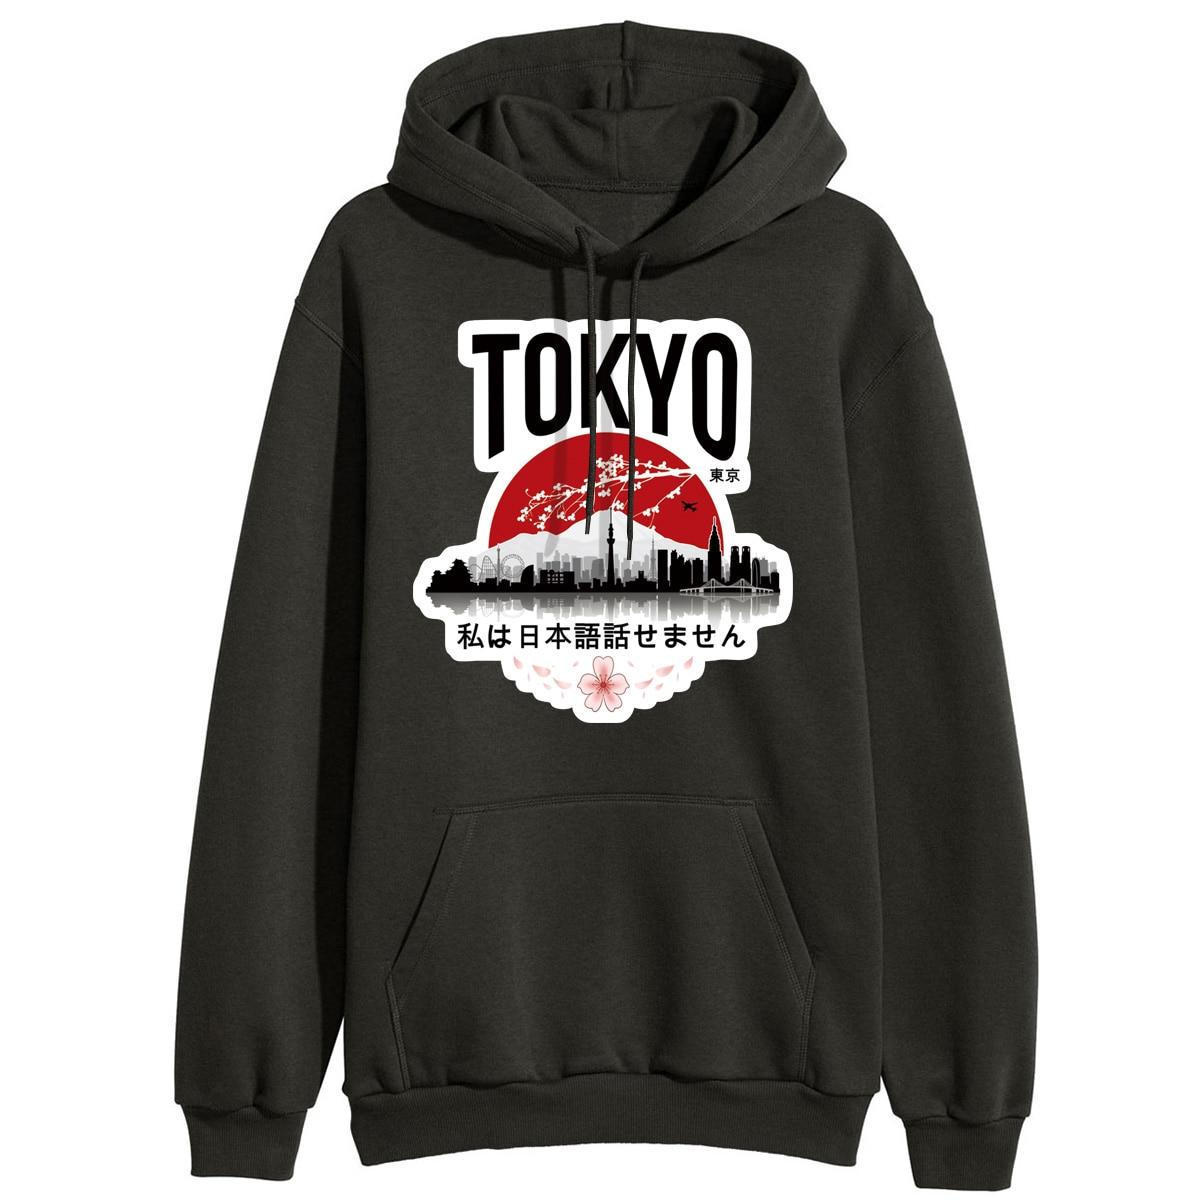 Hoodies For Women Winter Fleece Outerwear Sweatshirts Hooded Tokyo I Don't Speak Japanese Hoodie Pullover Femme Tracksuits Black